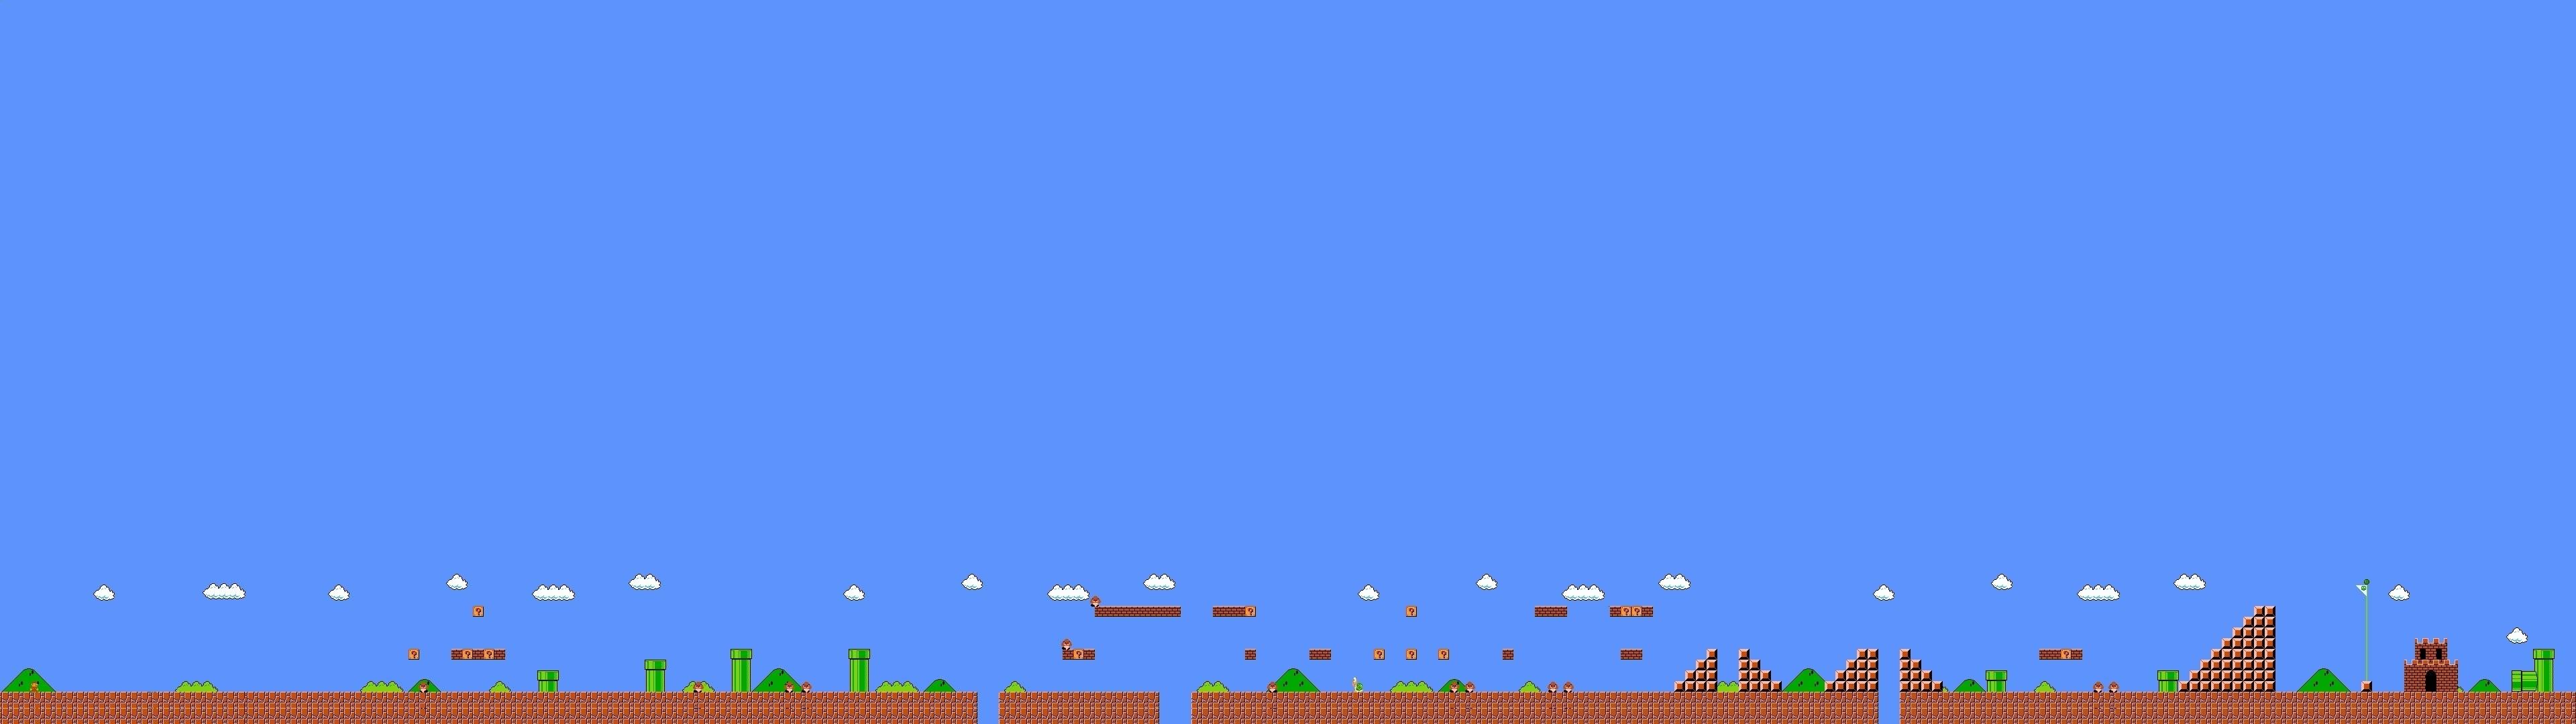 screen multi multiple videogame game jeu video mario bross wallpaper .